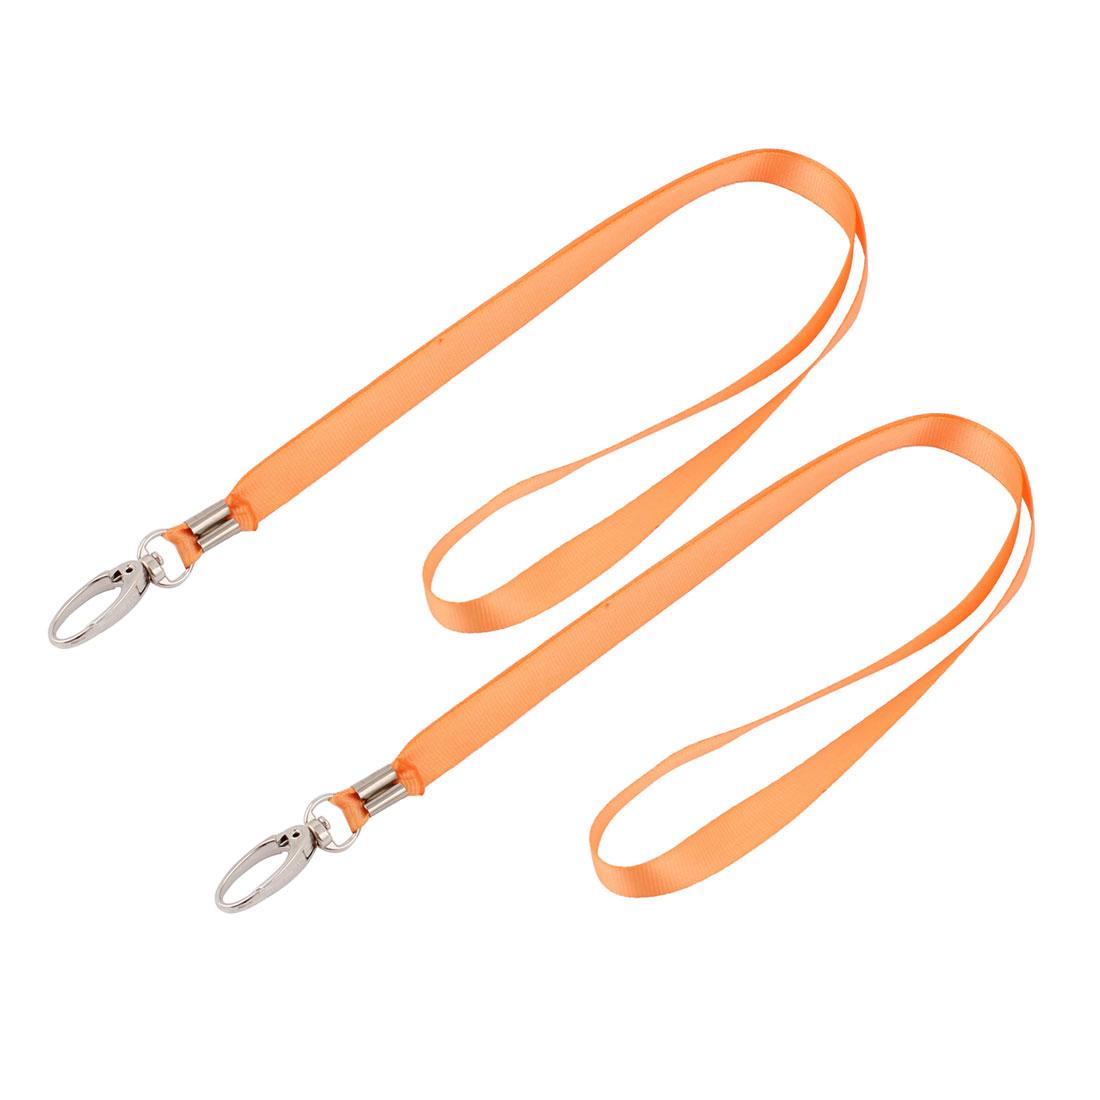 2pcs Metal Clip Orange Nylon Badge Card Name Tag Pouch Hanging Strap Neck String 75cm 2.5ft Long